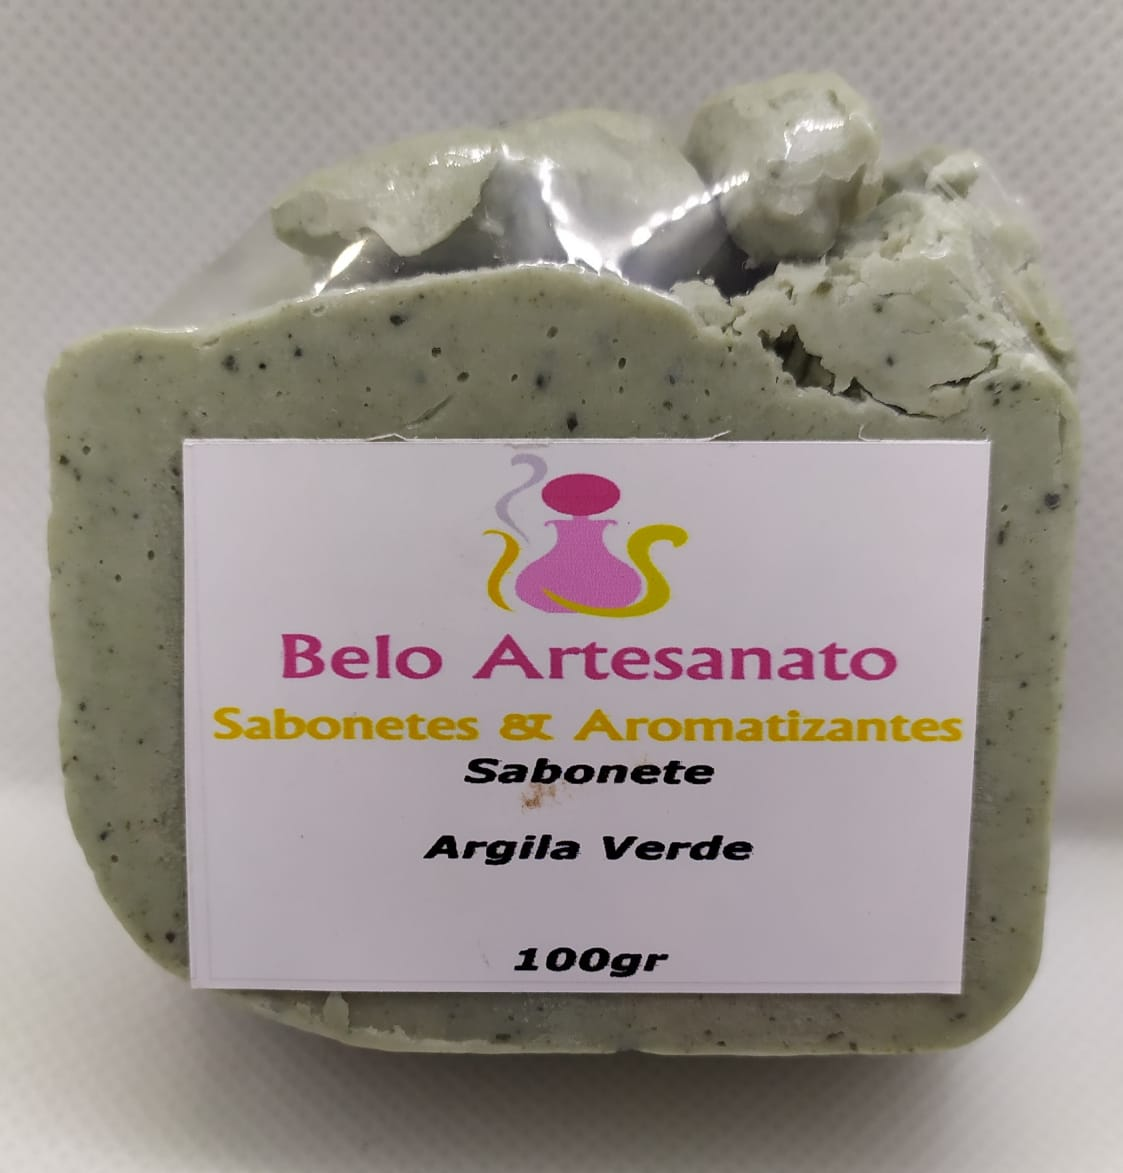 Sabonete de Argila Verde 100gr -Bactericida Fungicida Anti-inflamatório - Belo Artesanato